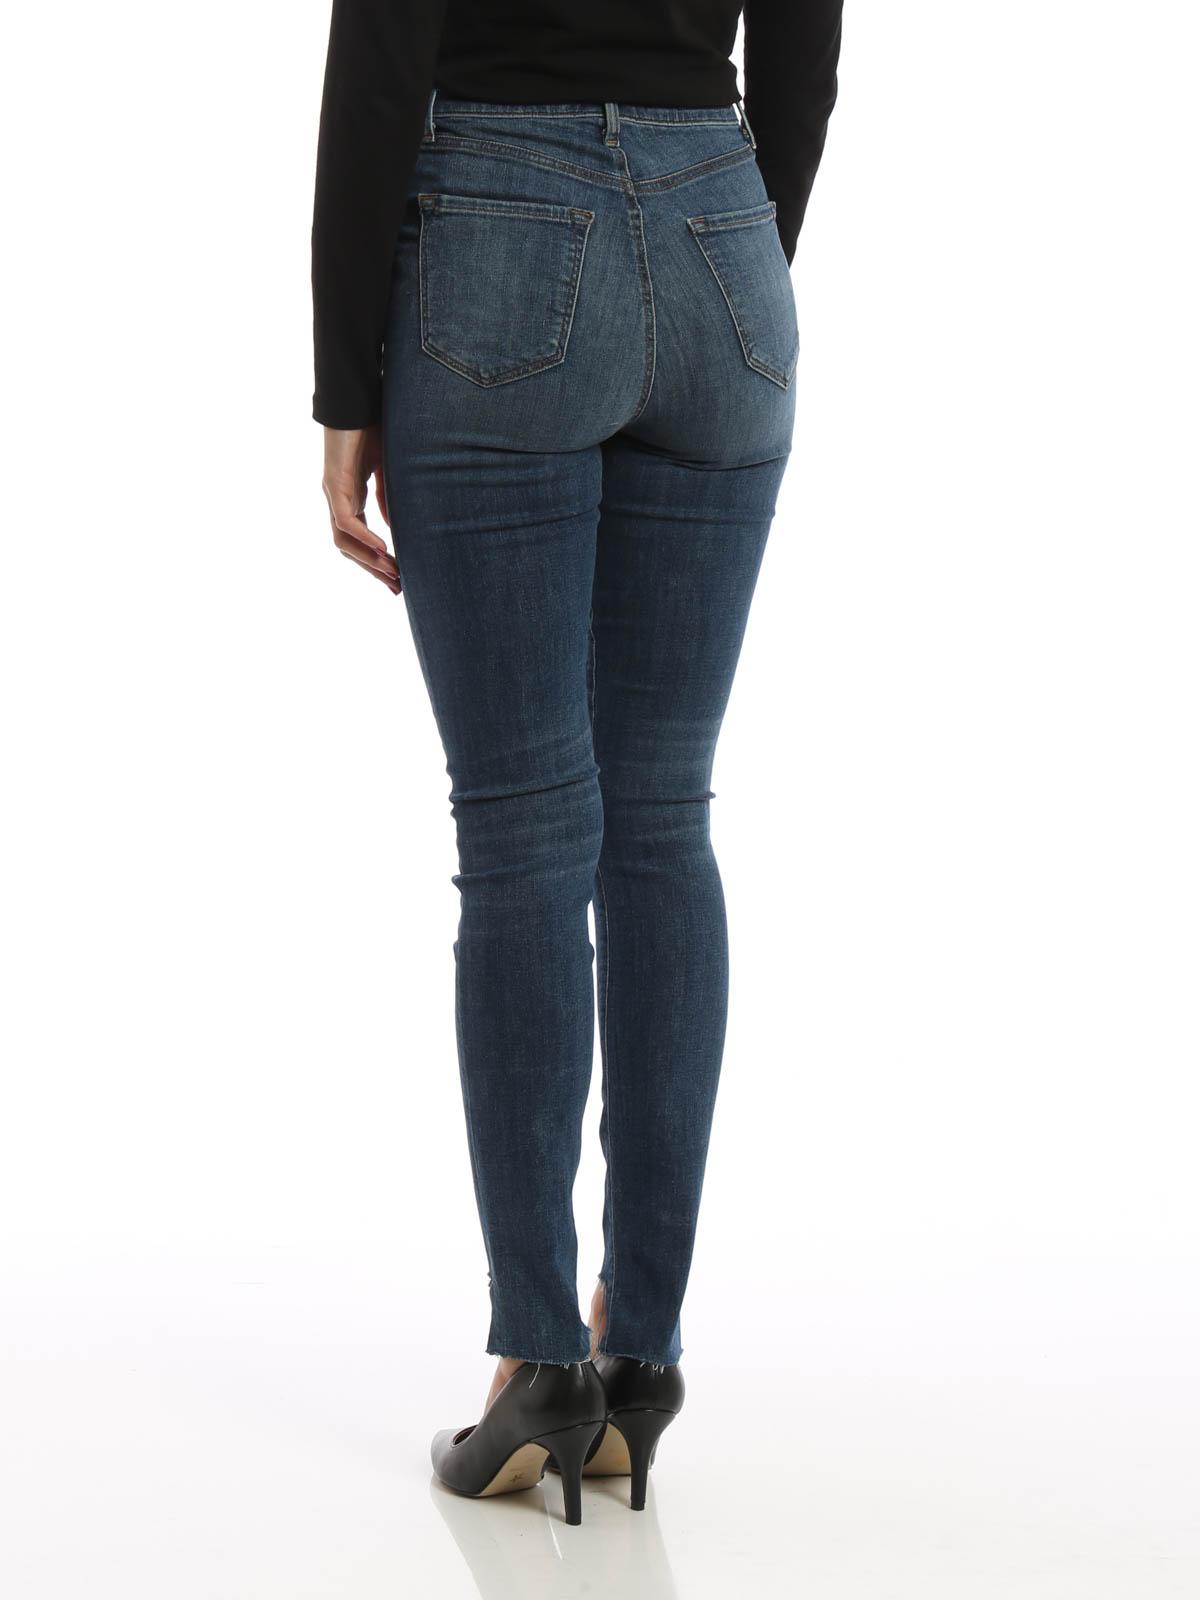 a0db8343dffd9 J Brand - Carolina super high-rise jeans - skinny jeans - JB000268 SCOUT